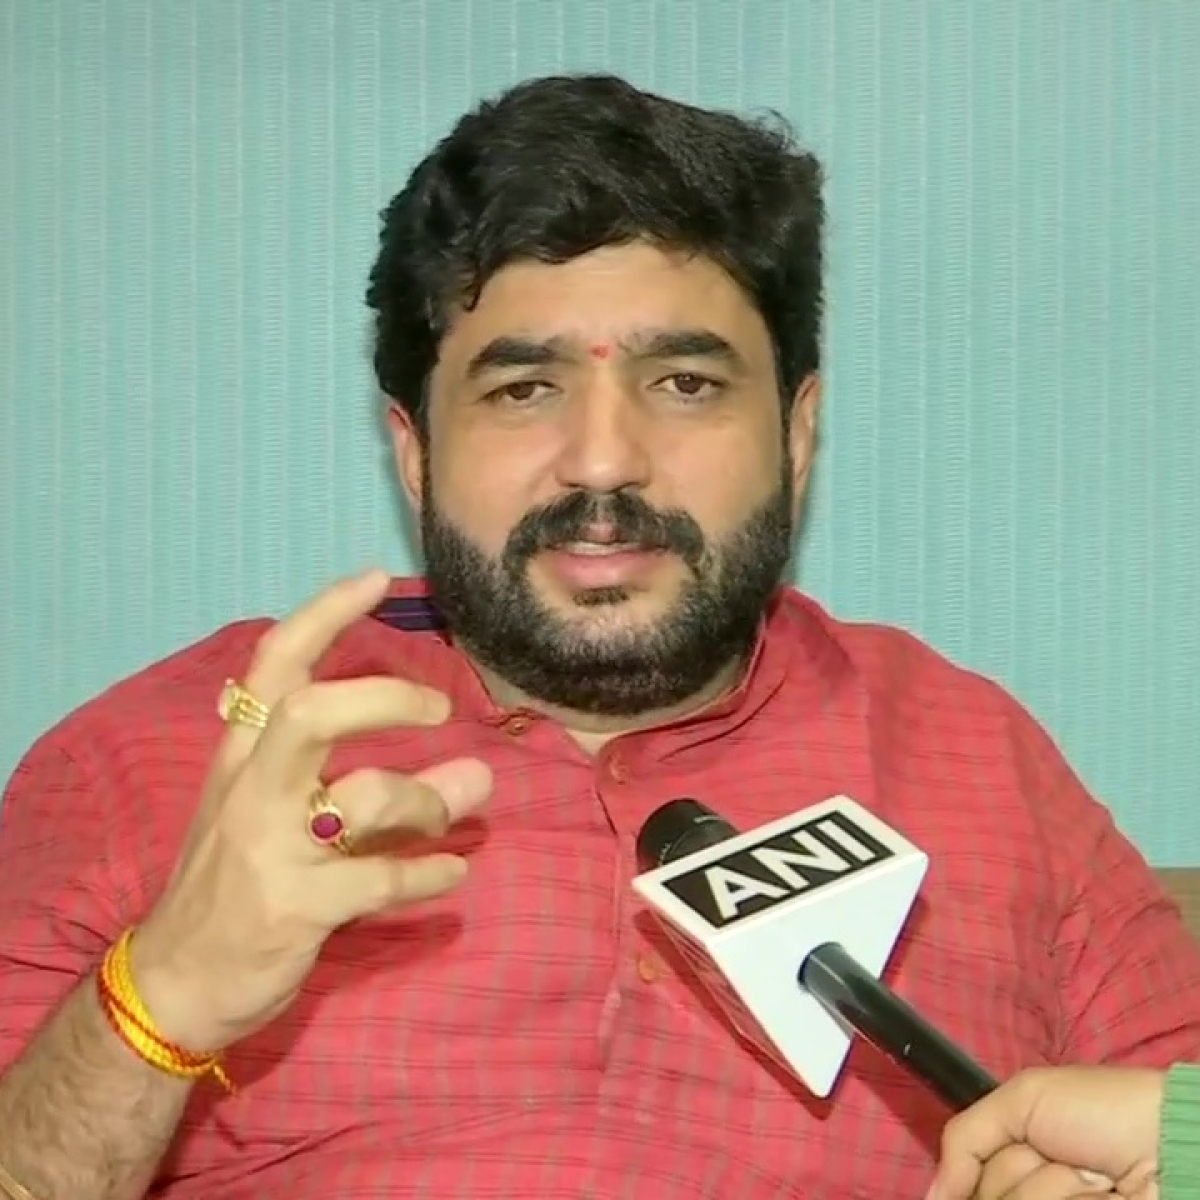 Imposing complete lockdown in Pune not necessary: Mayor Murlidhar Mohol